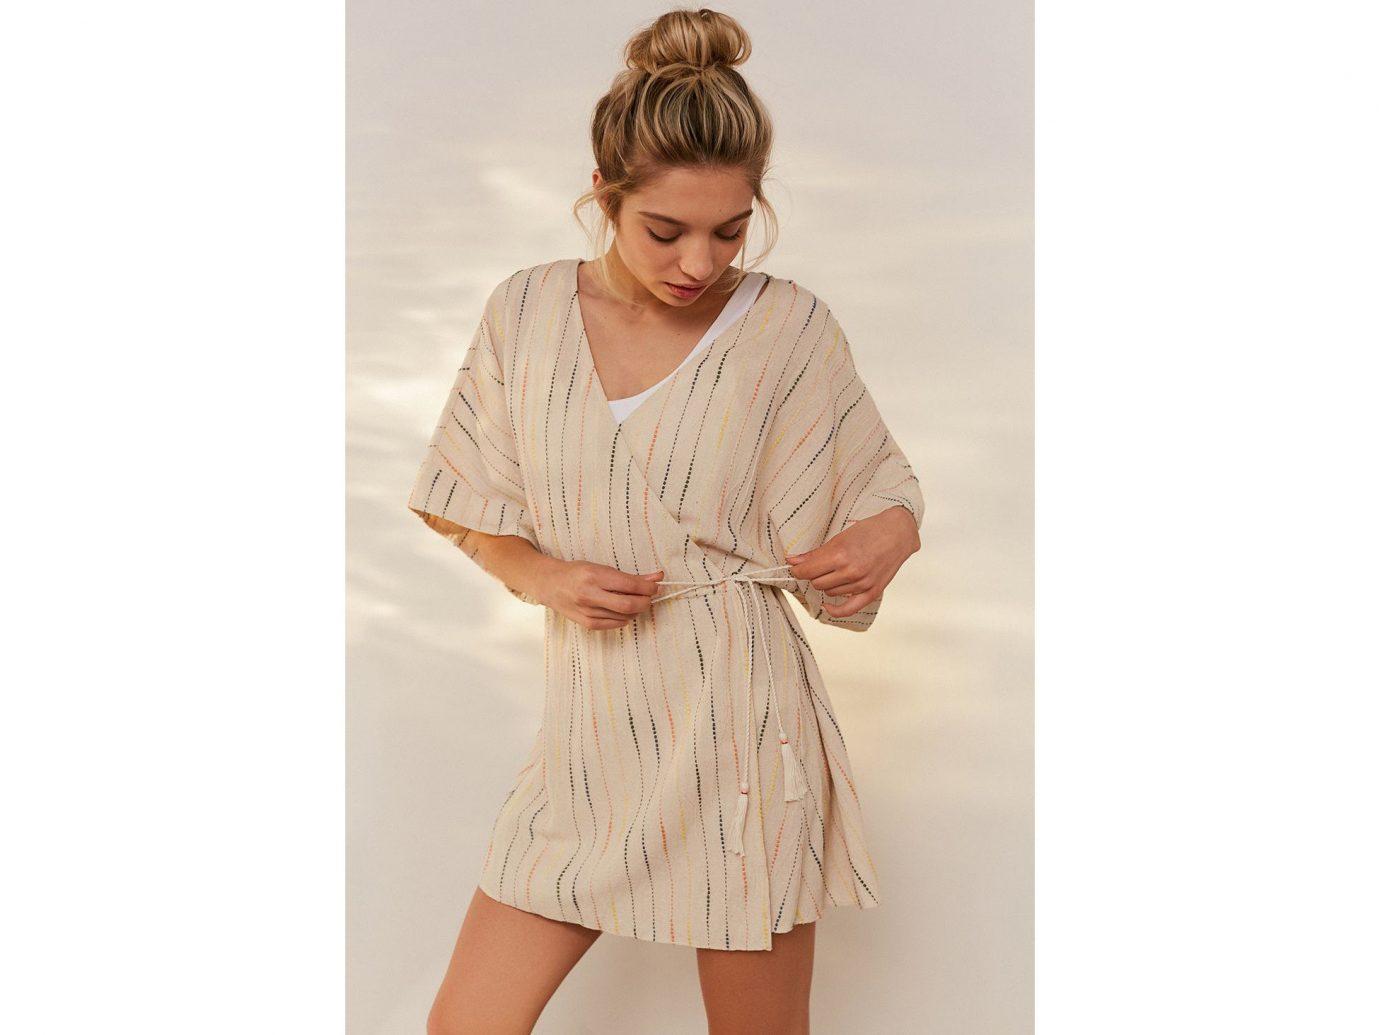 Style + Design Travel Shop clothing outerwear fashion model beige nightwear sleeve neck day dress robe